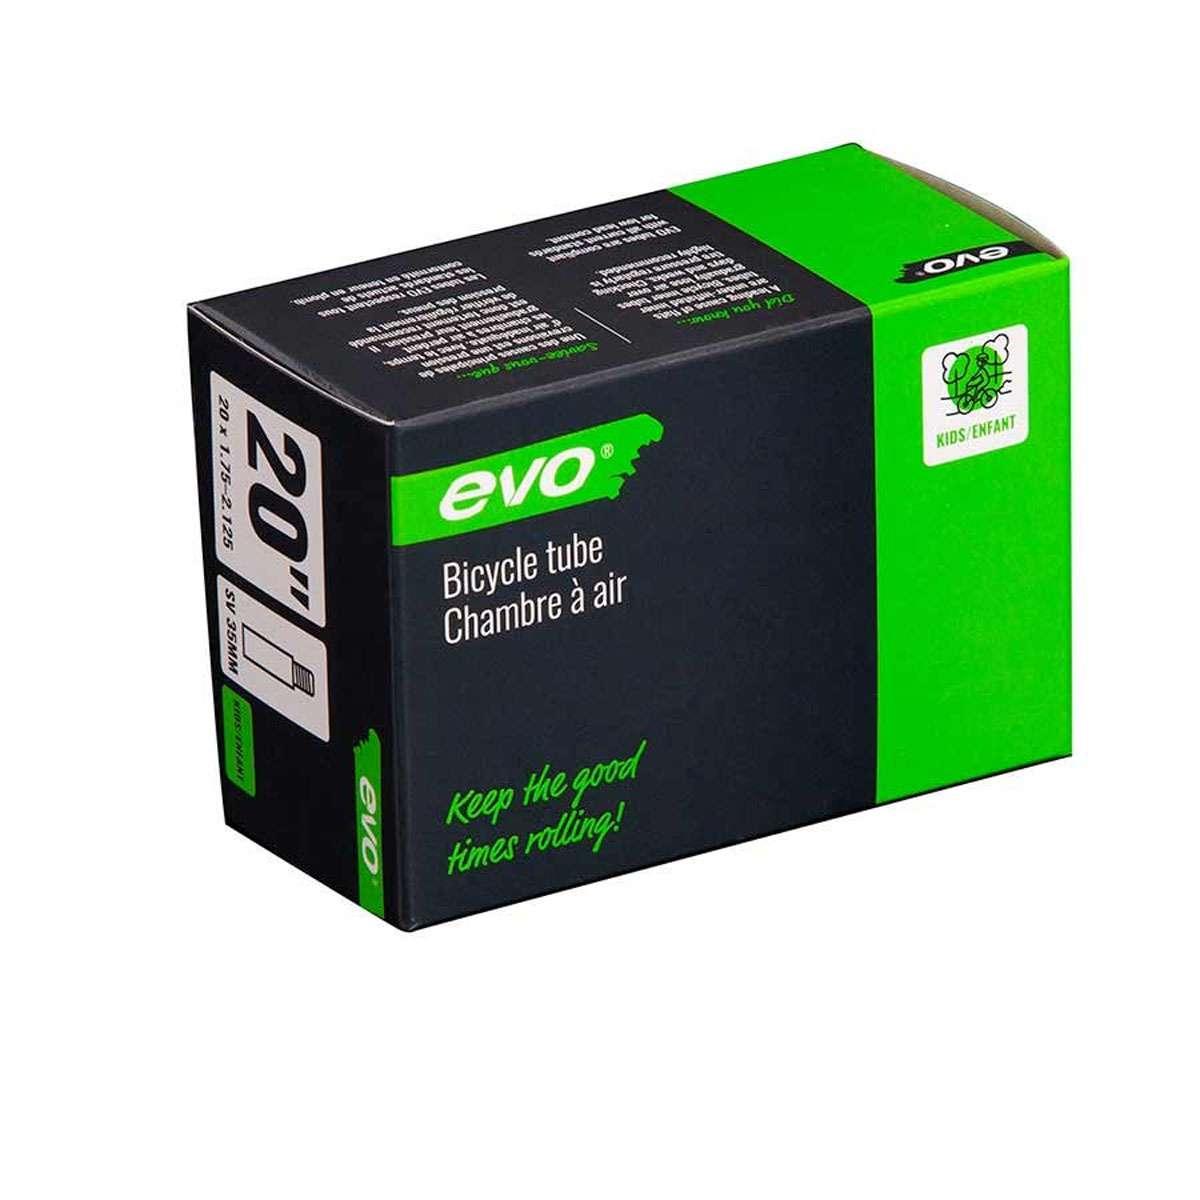 Evo Bicycle Tube - Schrader, 35mm, 20', 1.75-2.125 - 14EV.020176-07